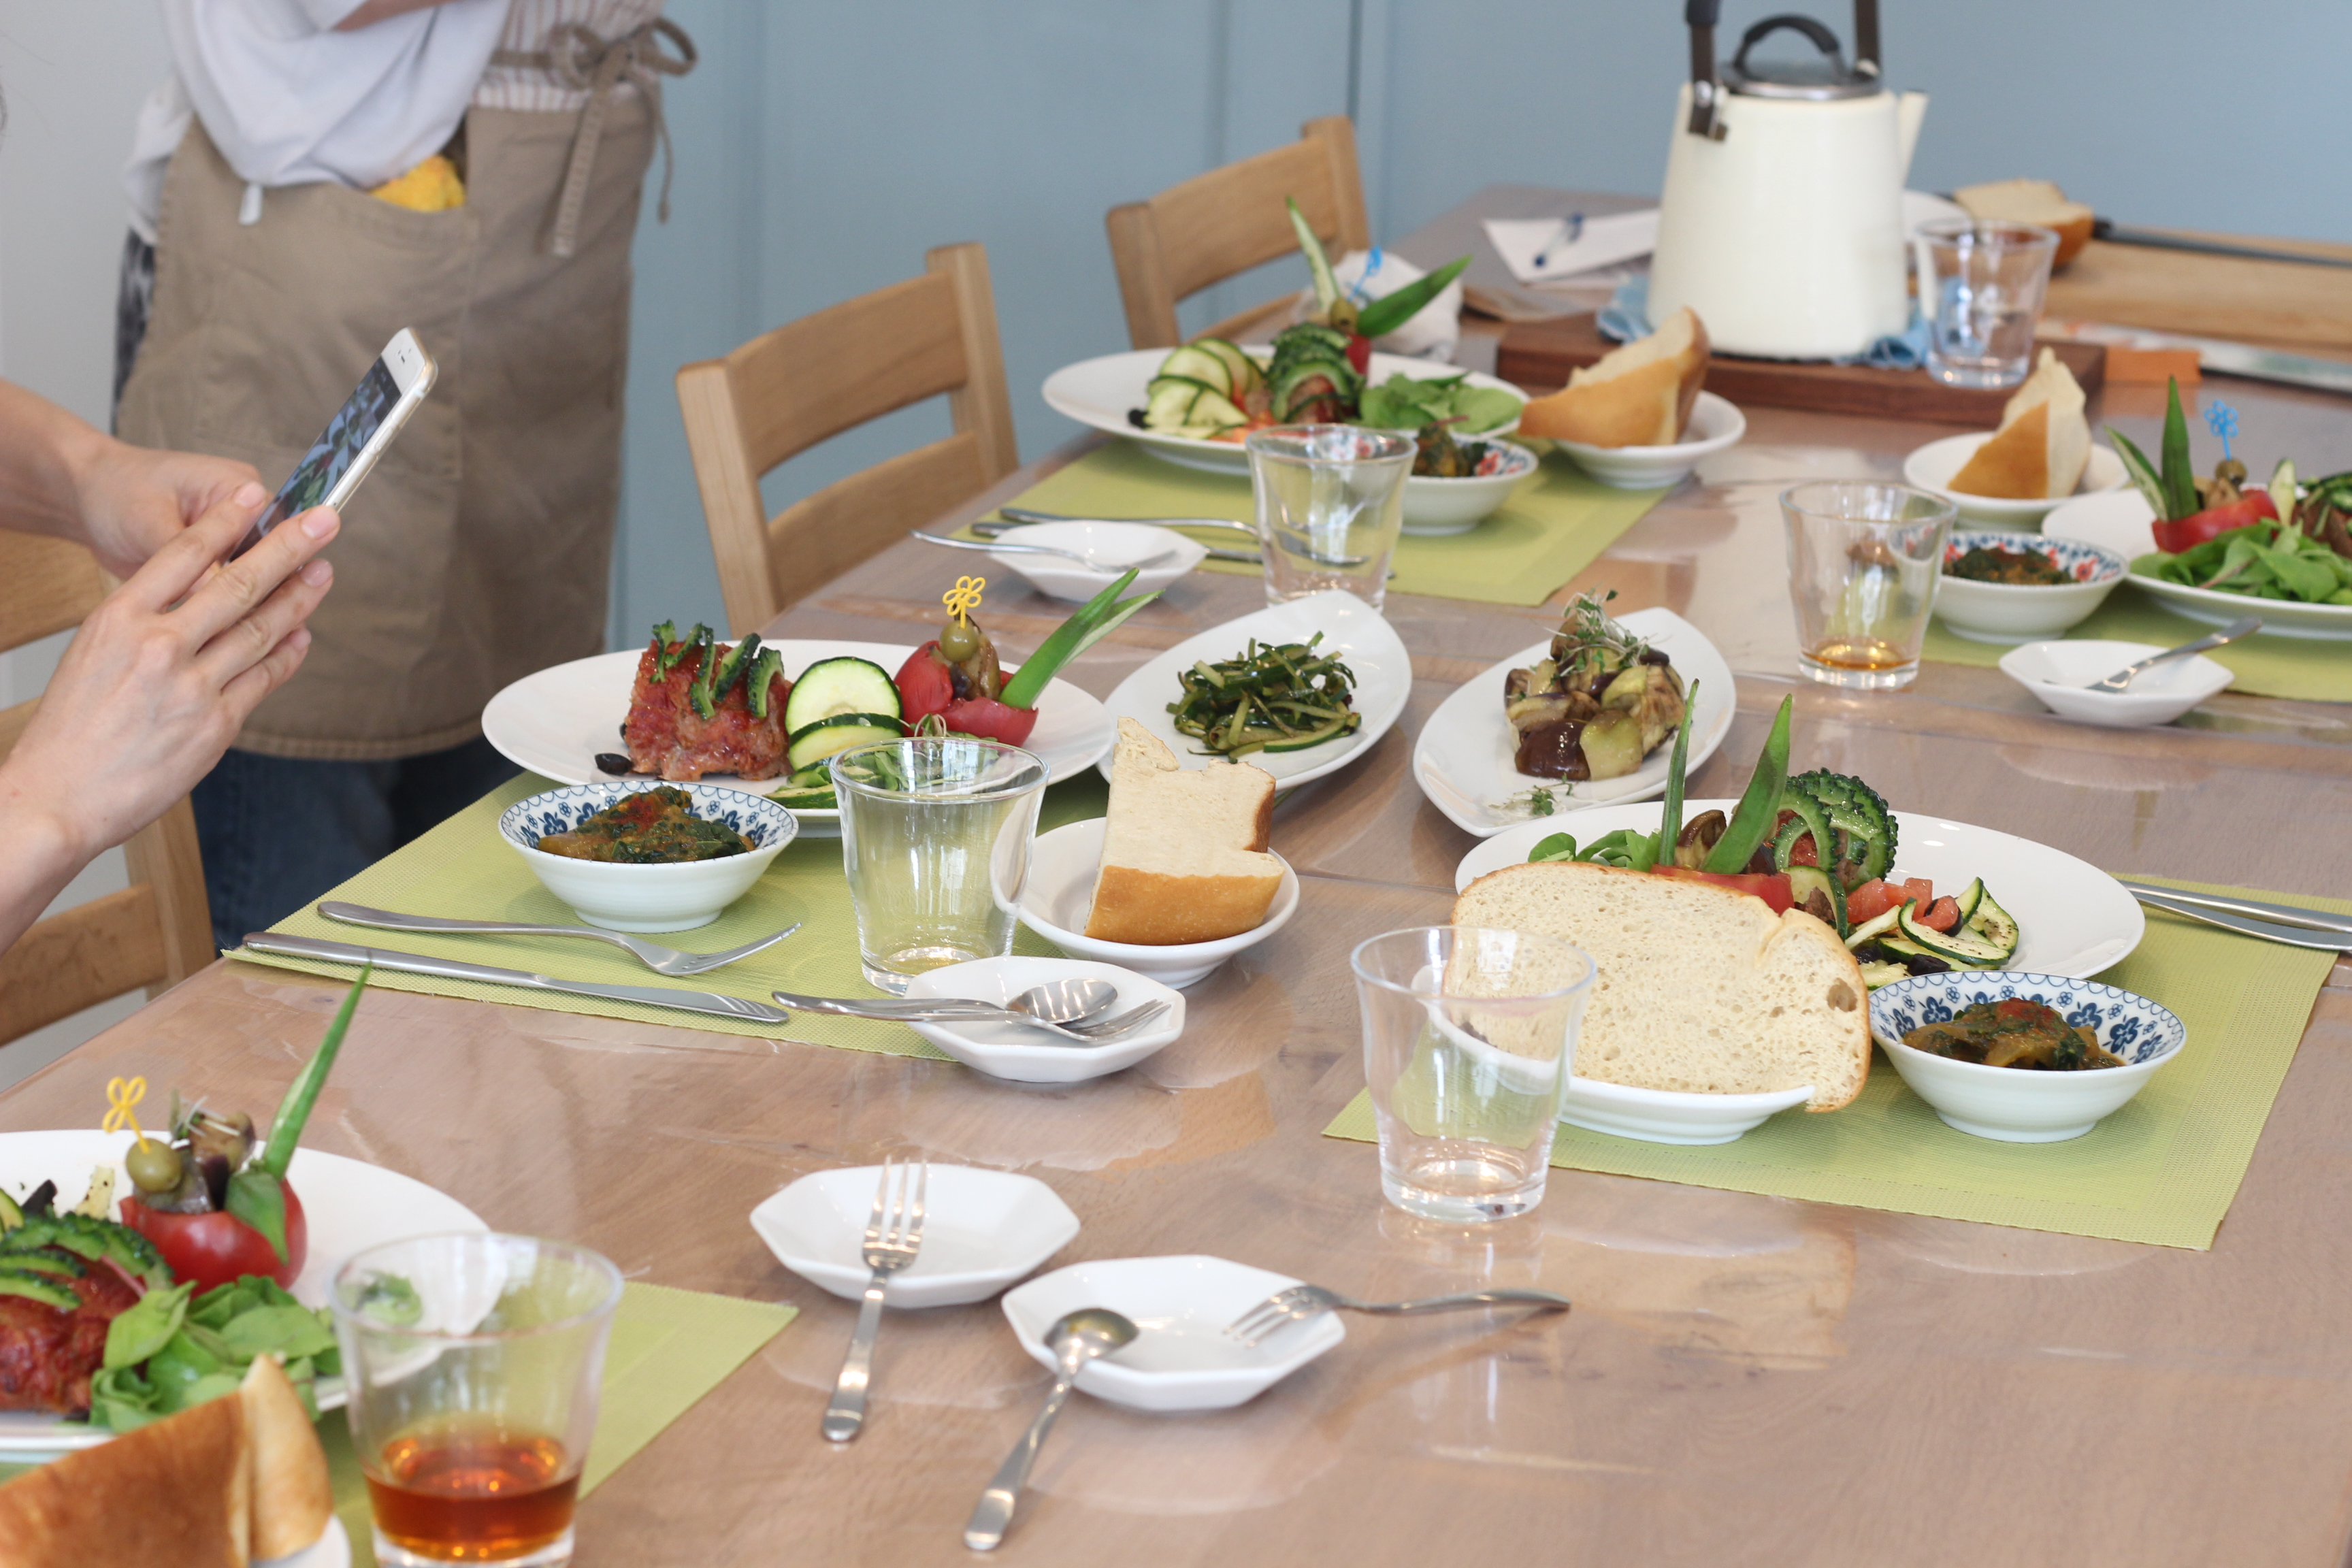 a-ta-sante糖質制限パン料理教室。大阪市阿倍野区。おしゃれで楽しい低糖質料理教室8月2日目。テーマは、『夏野菜』